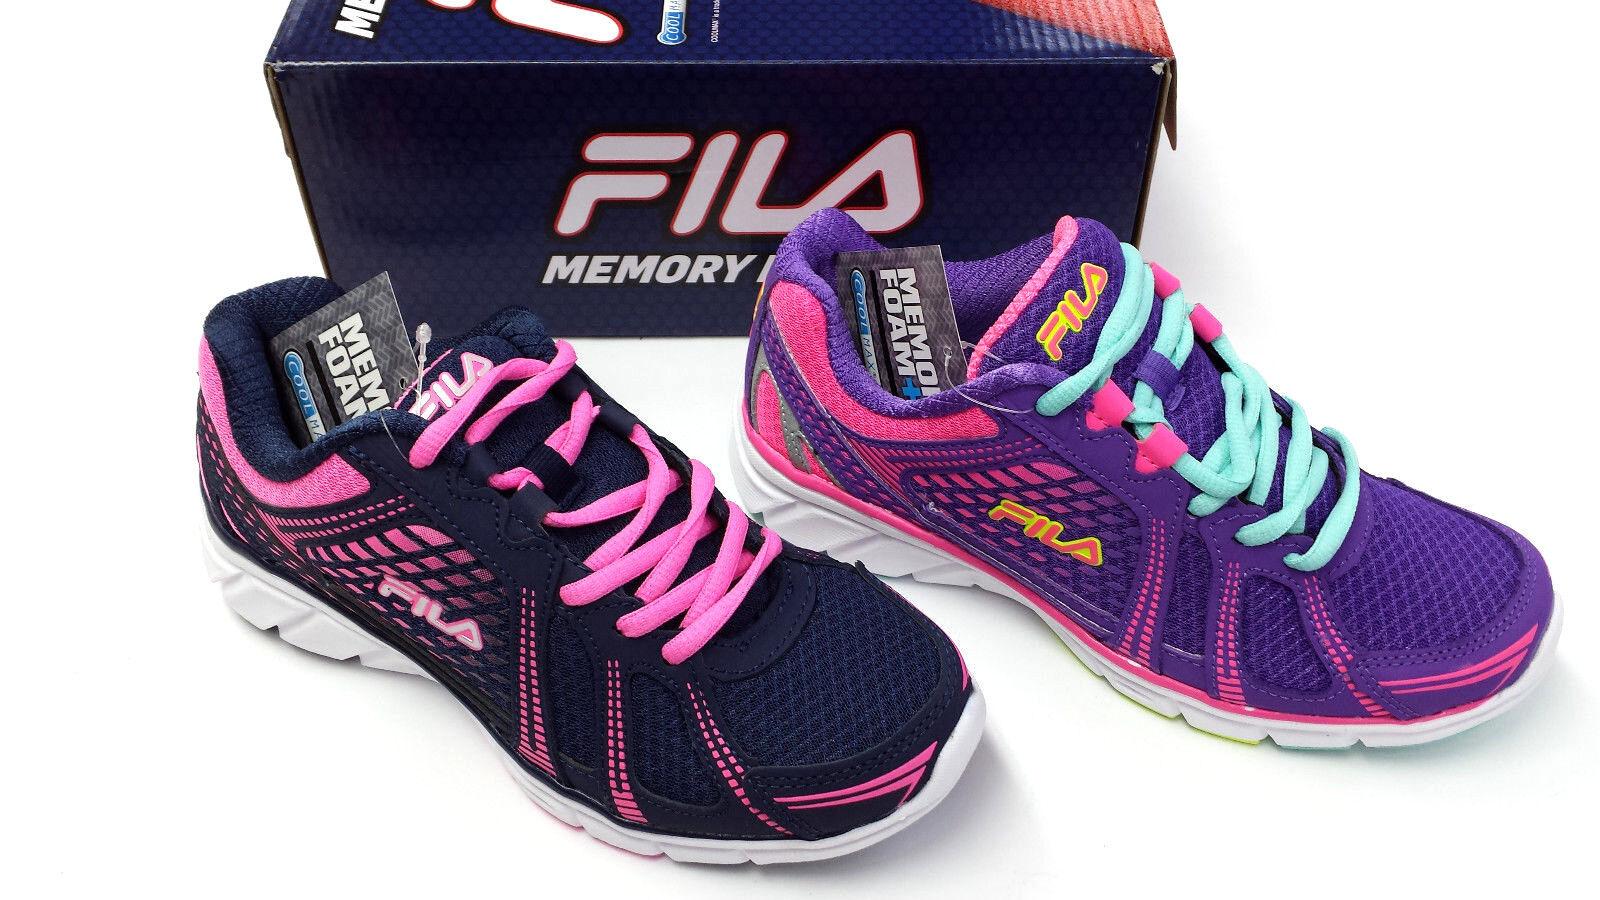 Fila Women Athletic Running Sneaker - MEMORY PASSAGE Seasonal price cuts, discount benefits